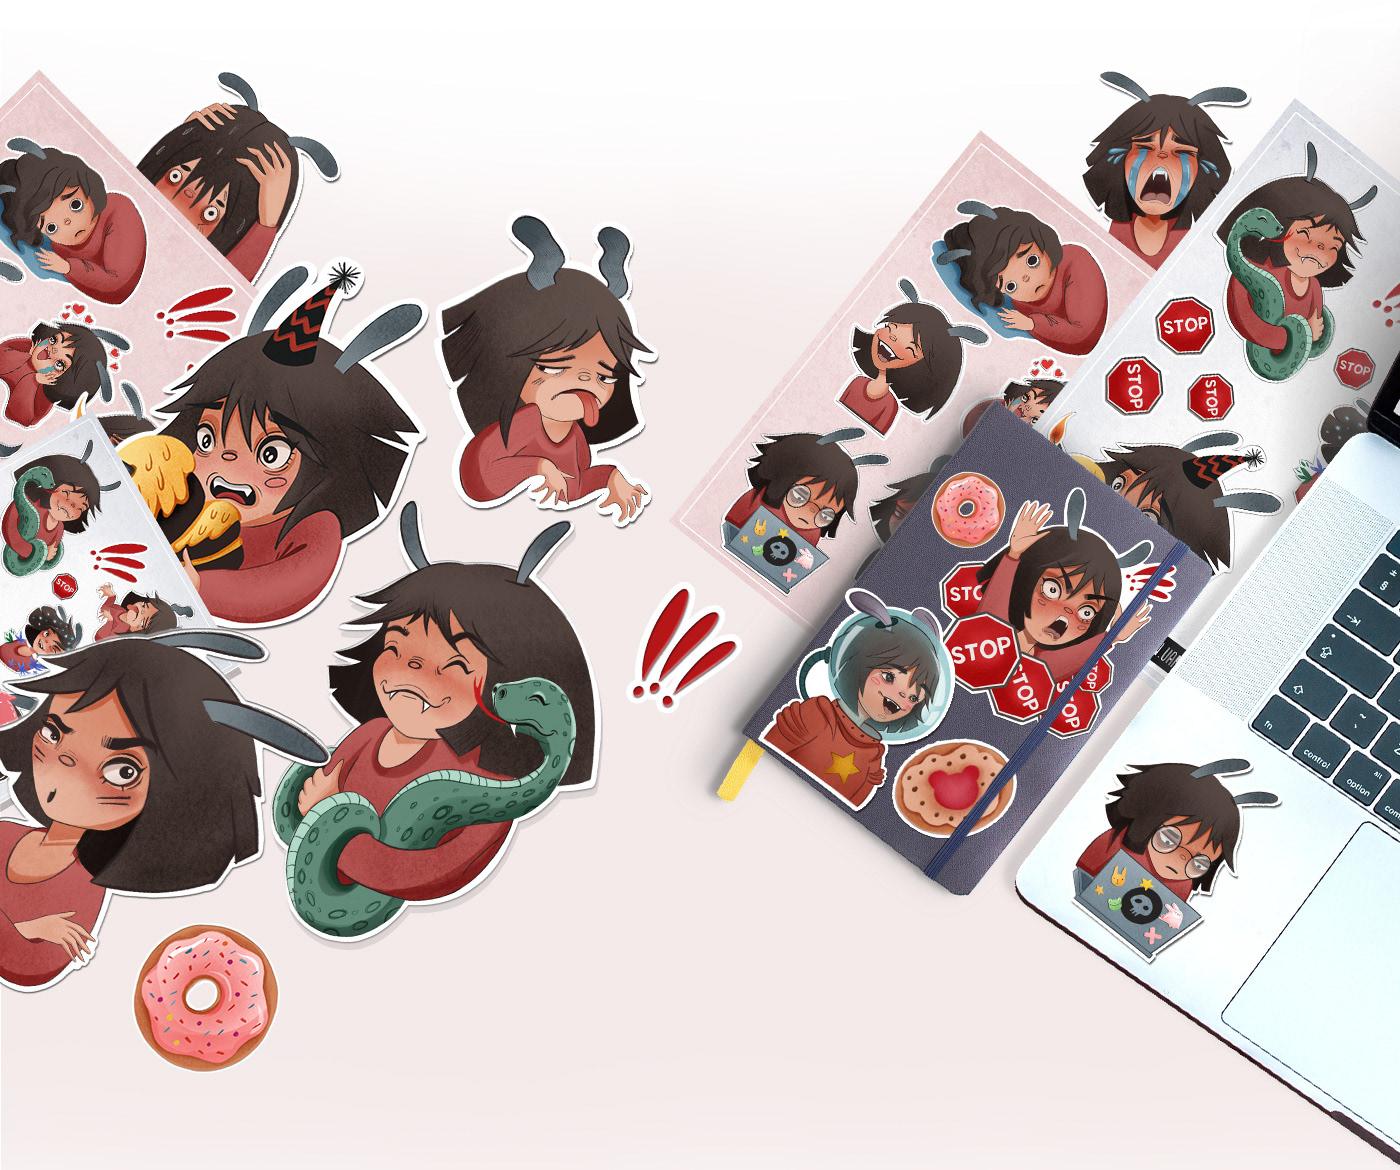 Character design  Digital Art  ILLUSTRATION  illustrations sketch sticker sticker pack stickers Telegram telegram stickers